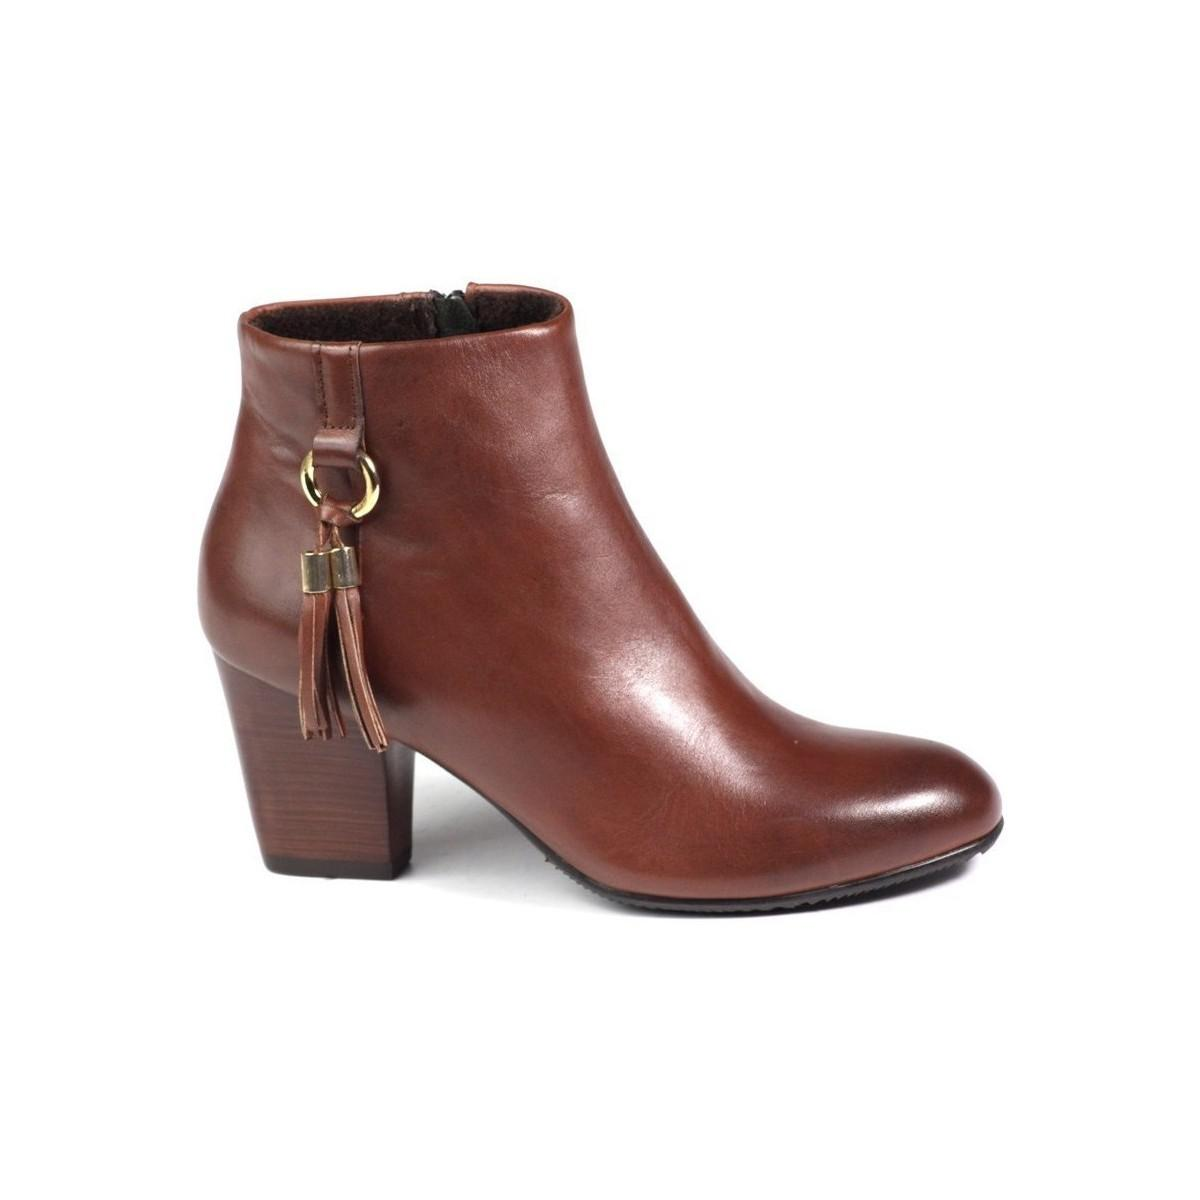 Ryłko 7cvn1ckk3 Women's Low Ankle Boots In Brown